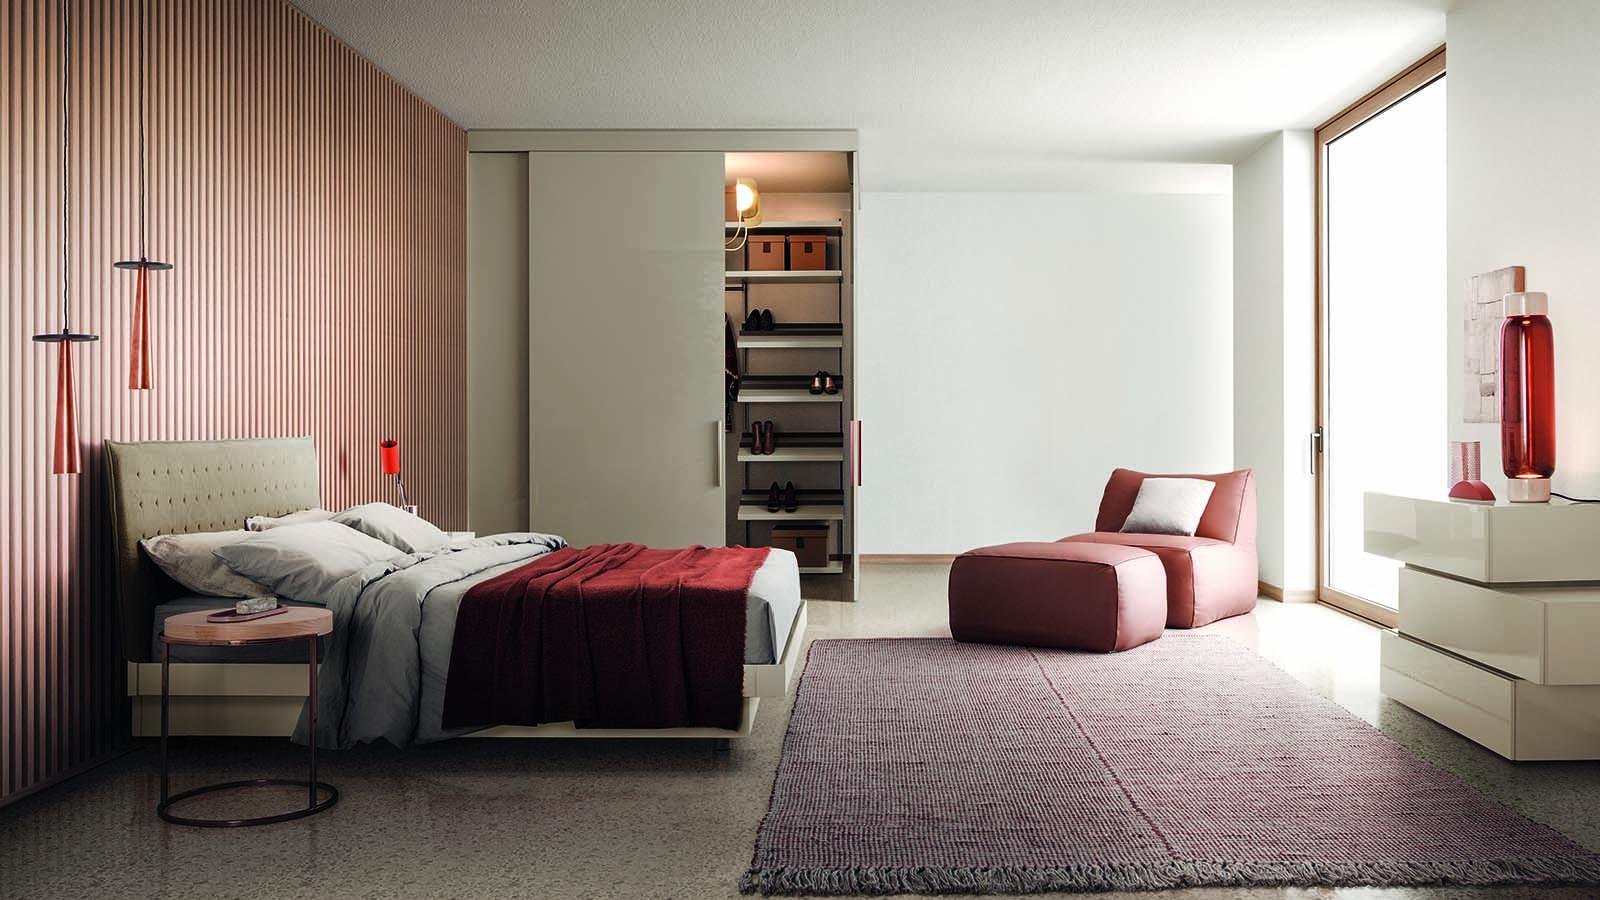 Alfa-bed-testata-PIANCA